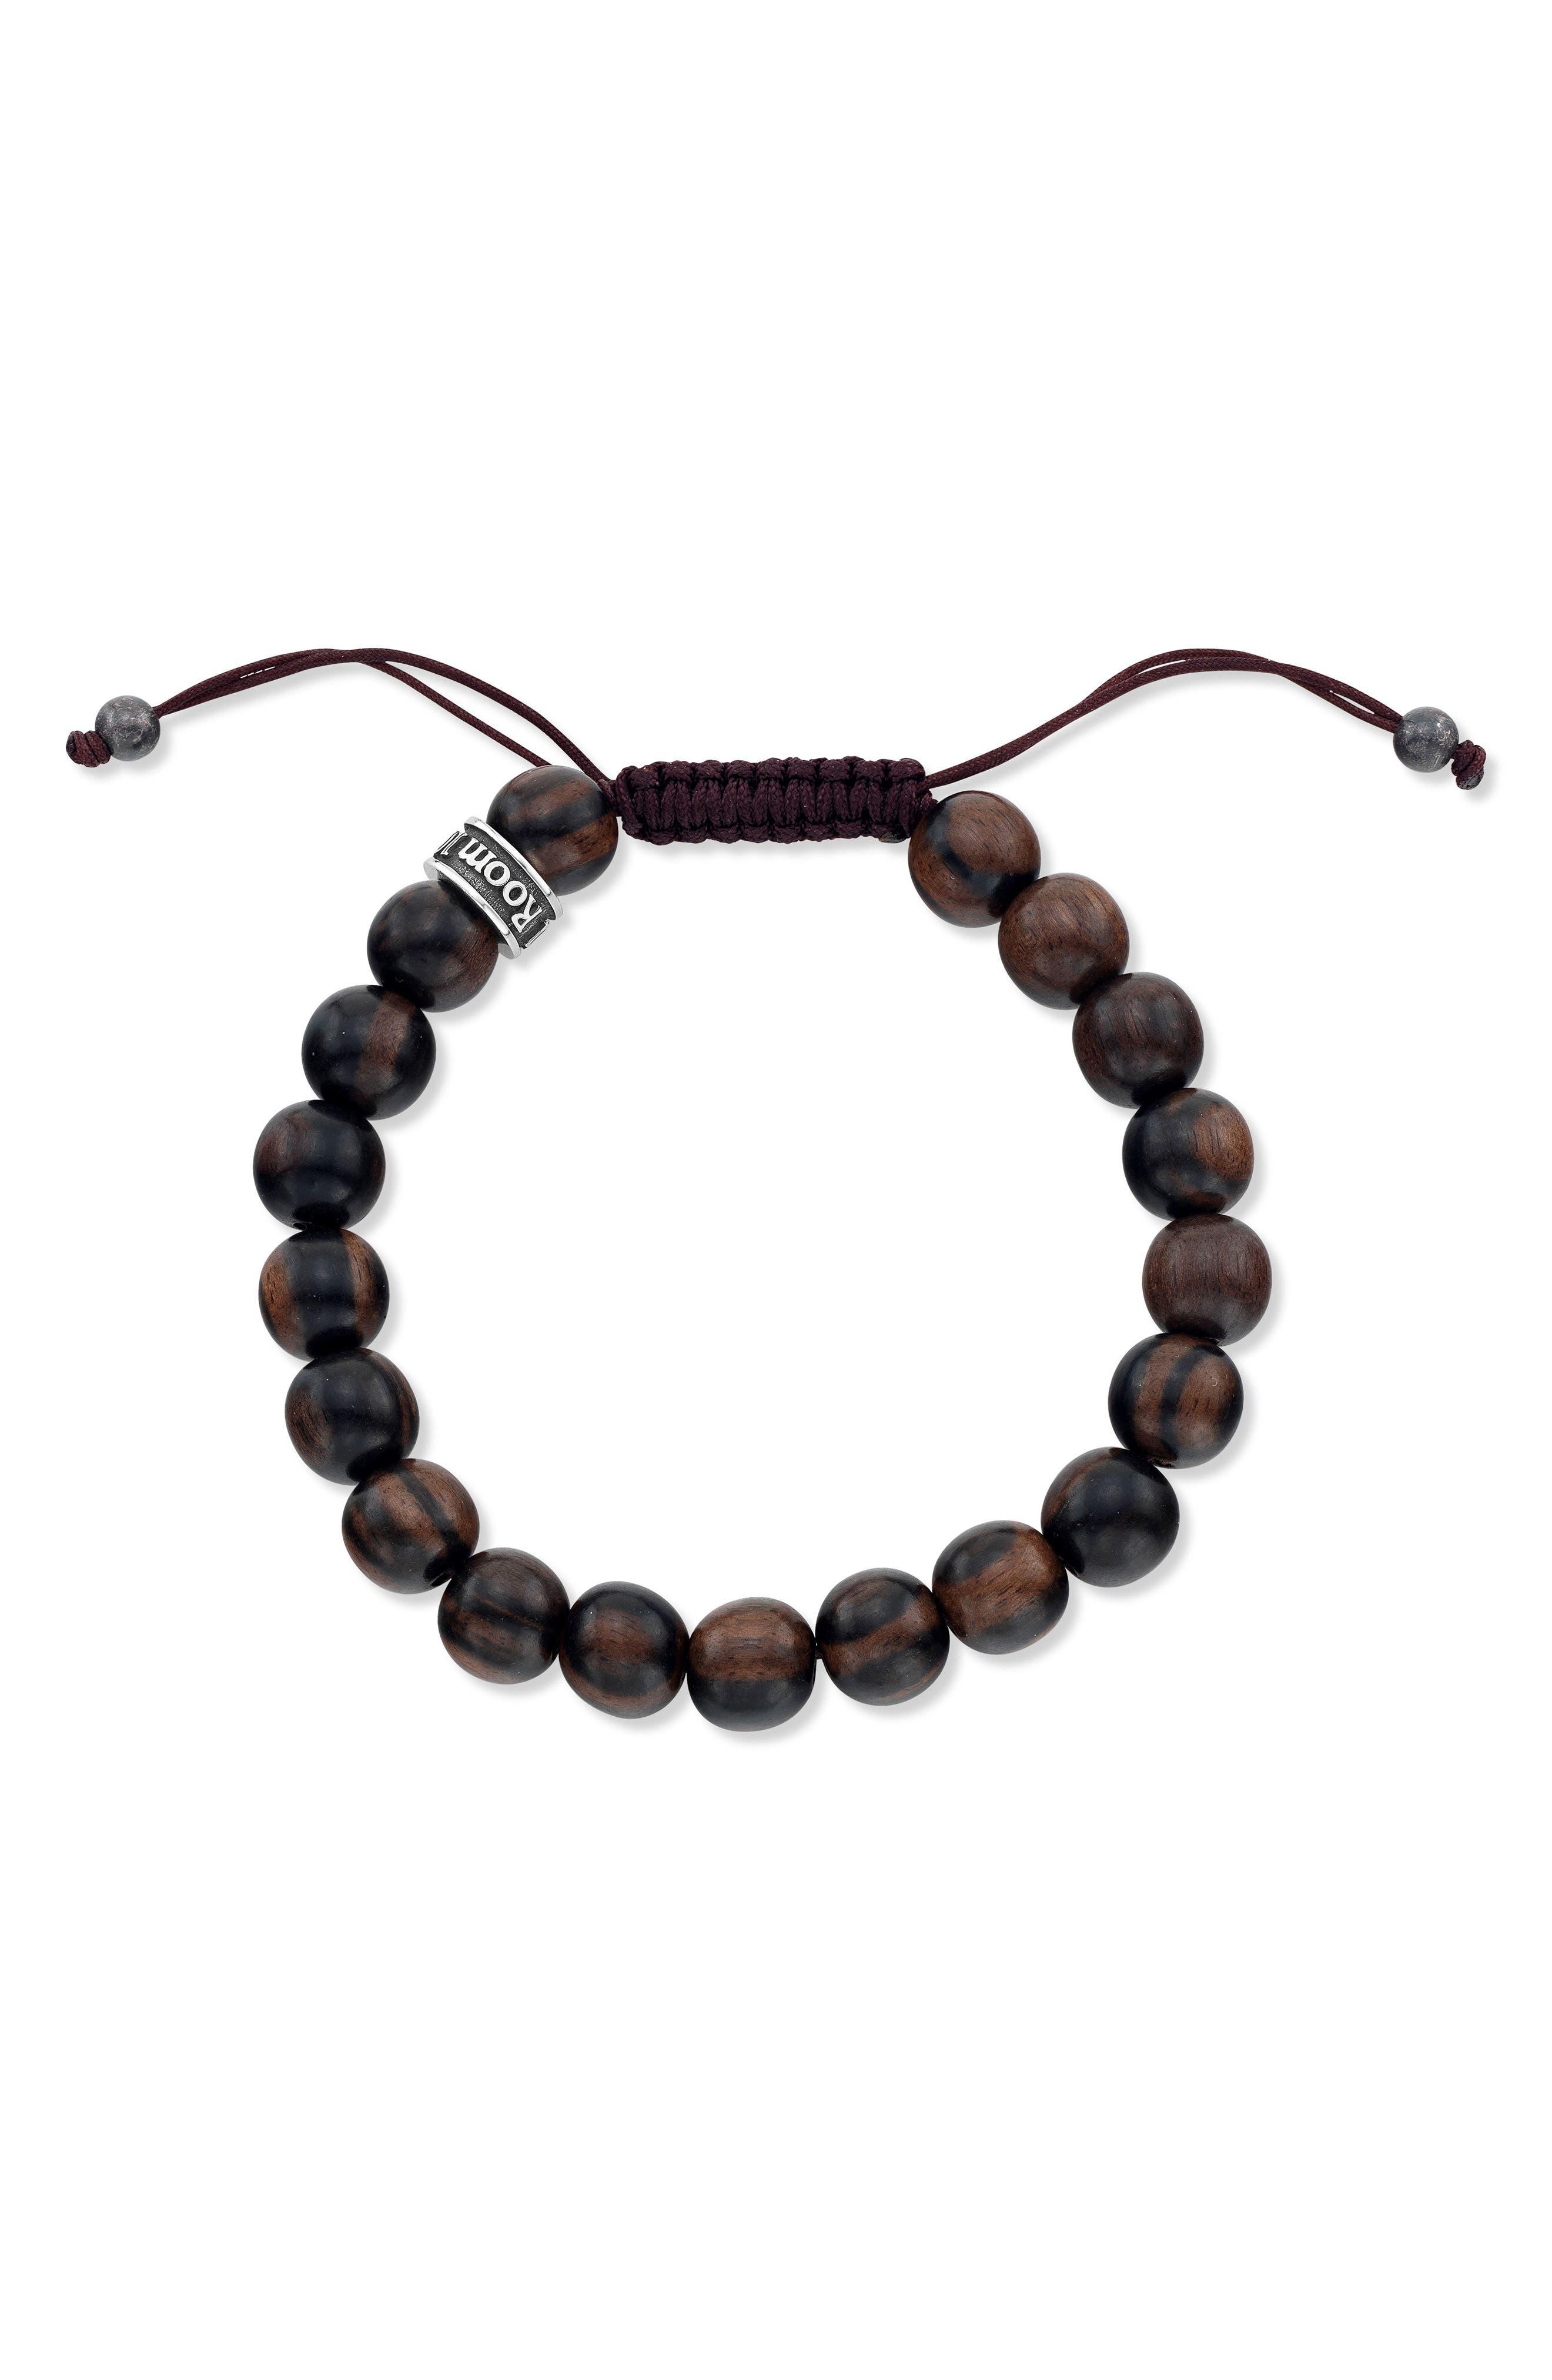 Alternate Image 1 Selected - Room101 Wood Bead Shamballa Bracelet